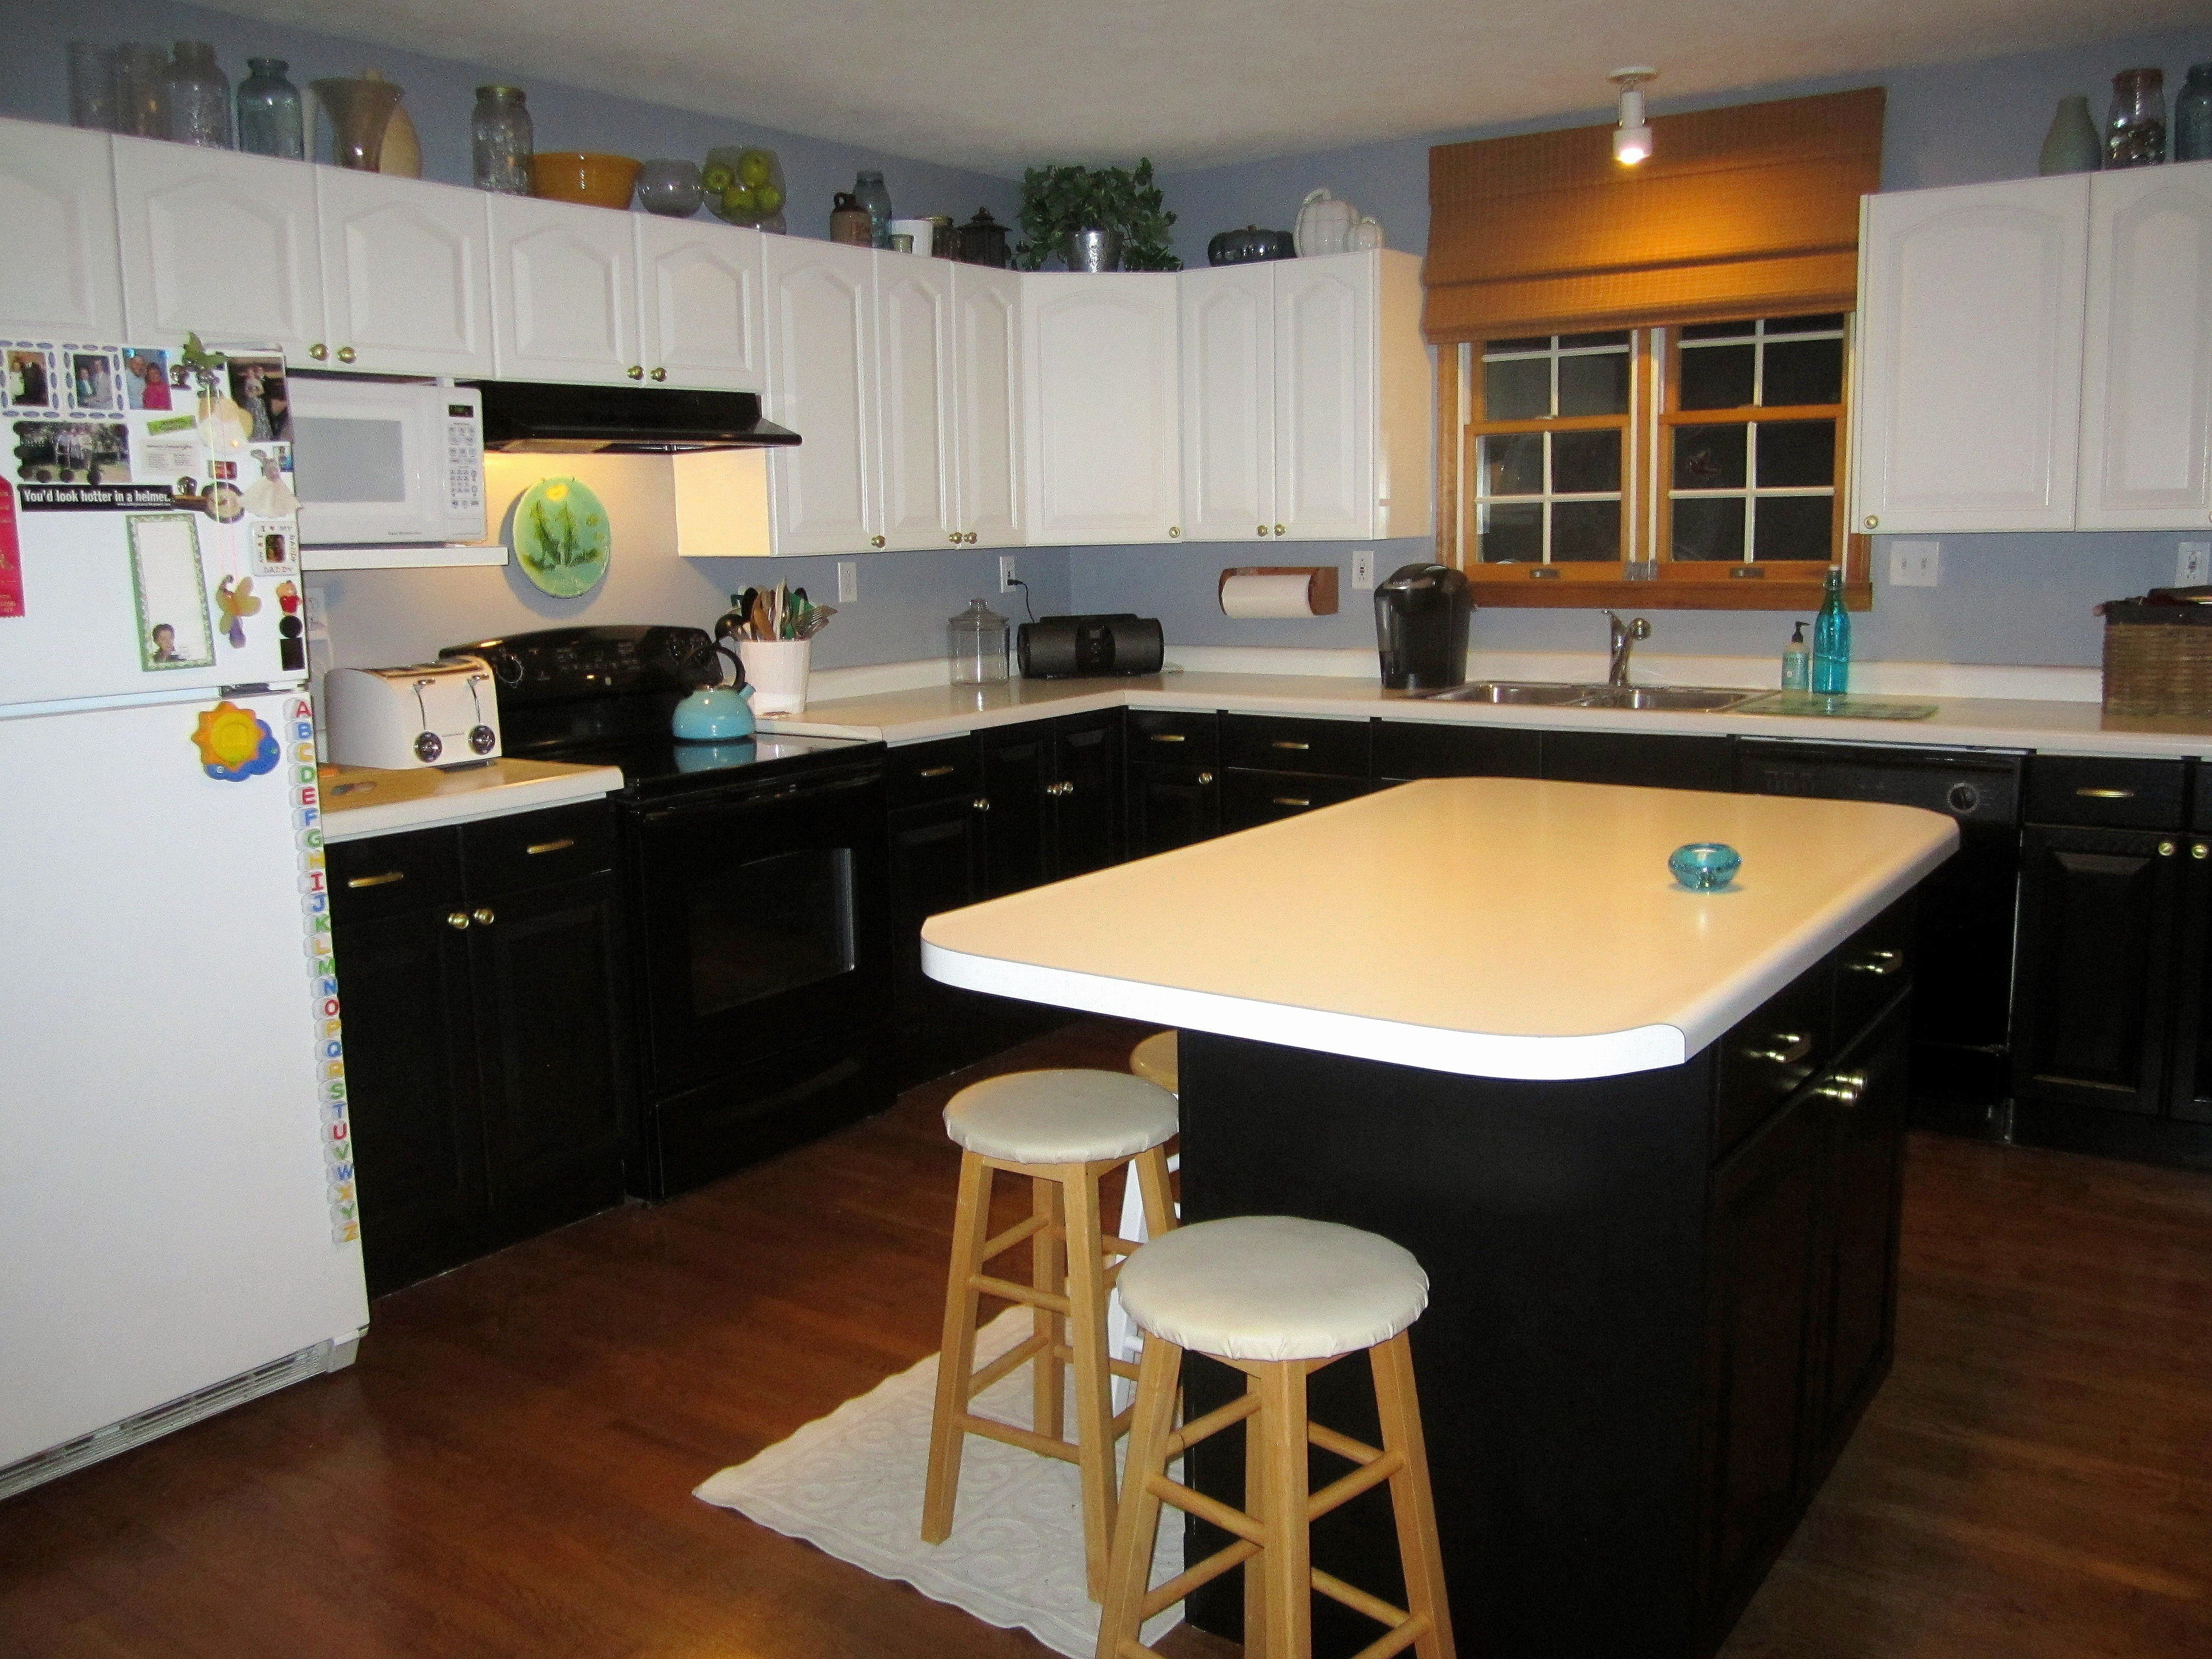 Stunning Kitchen Cabinet Ratings Luxury Kitchen Cabinets Kitchen Cabinets Small Kitchen Design Layout